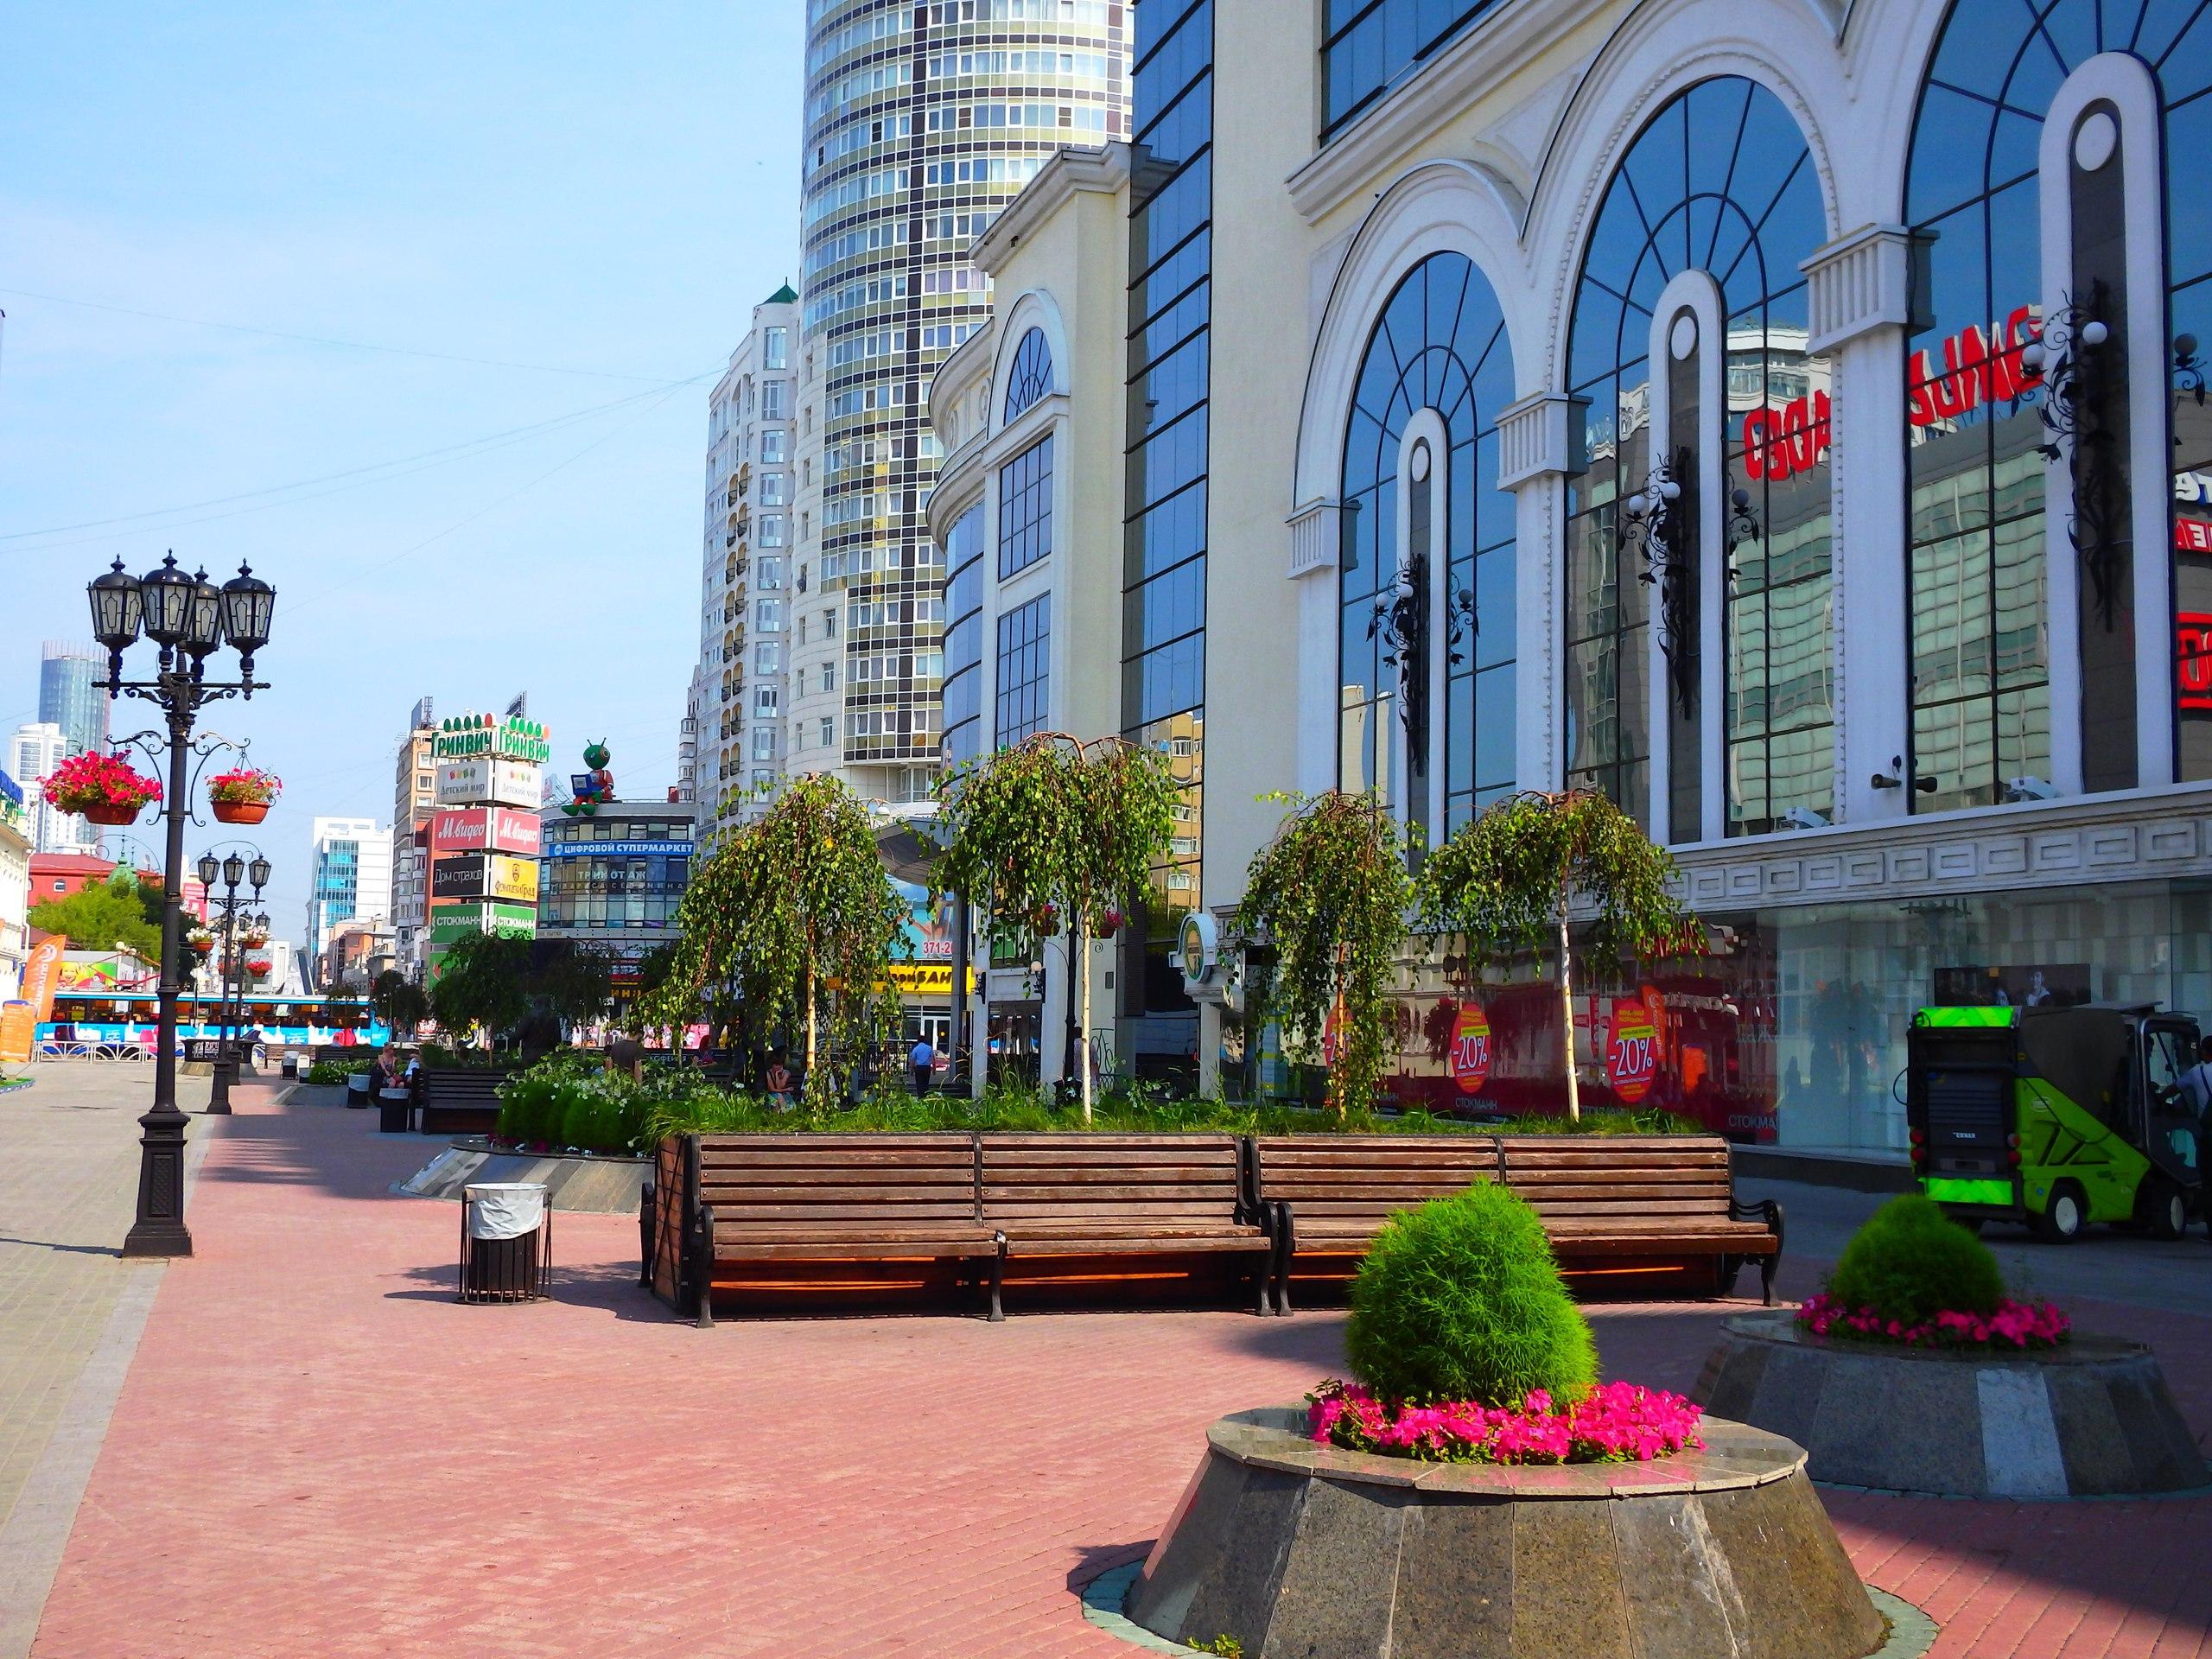 Екатеринбург улицы в картинках